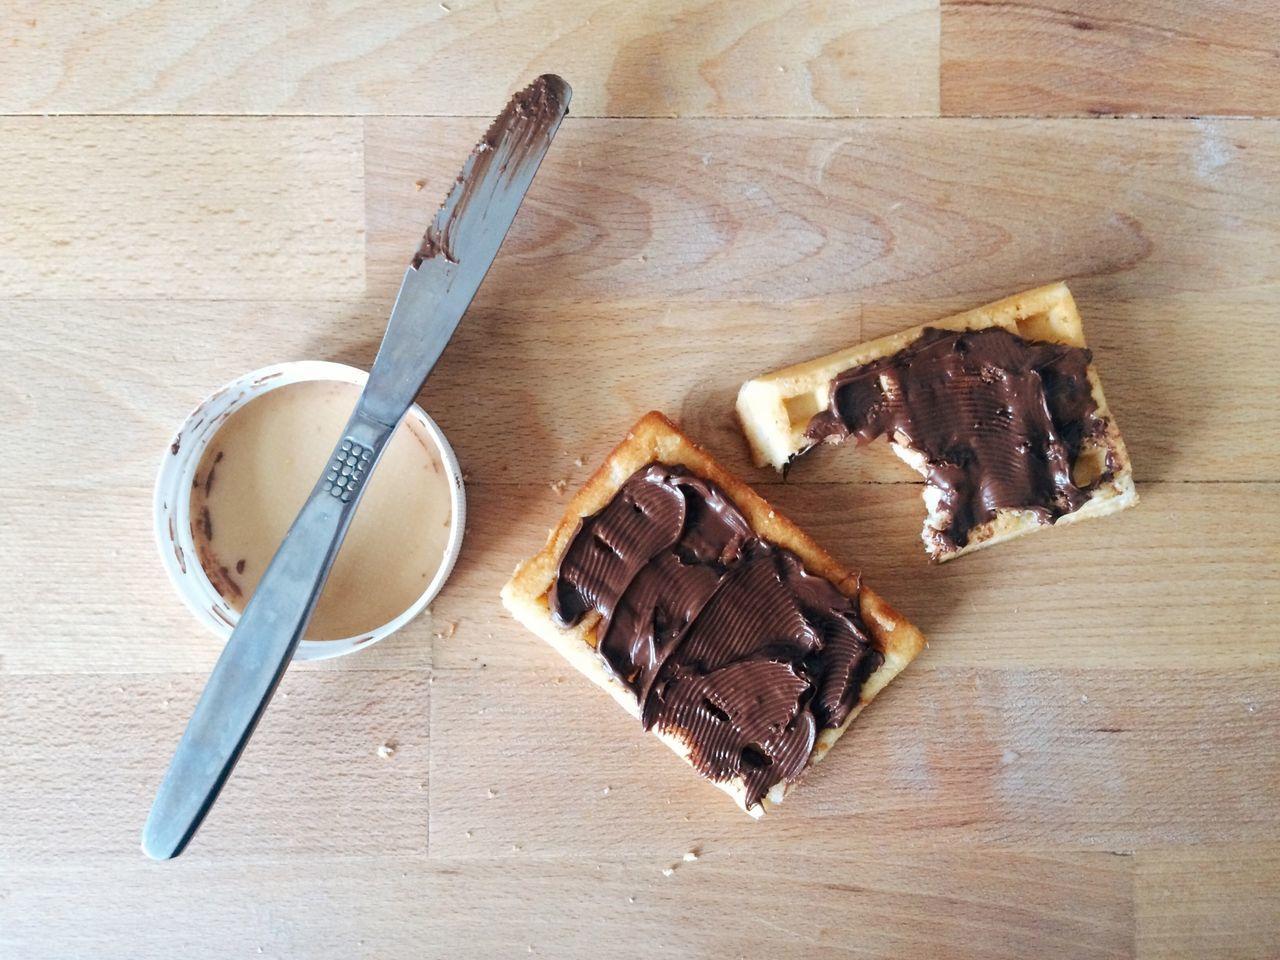 View of breakfast